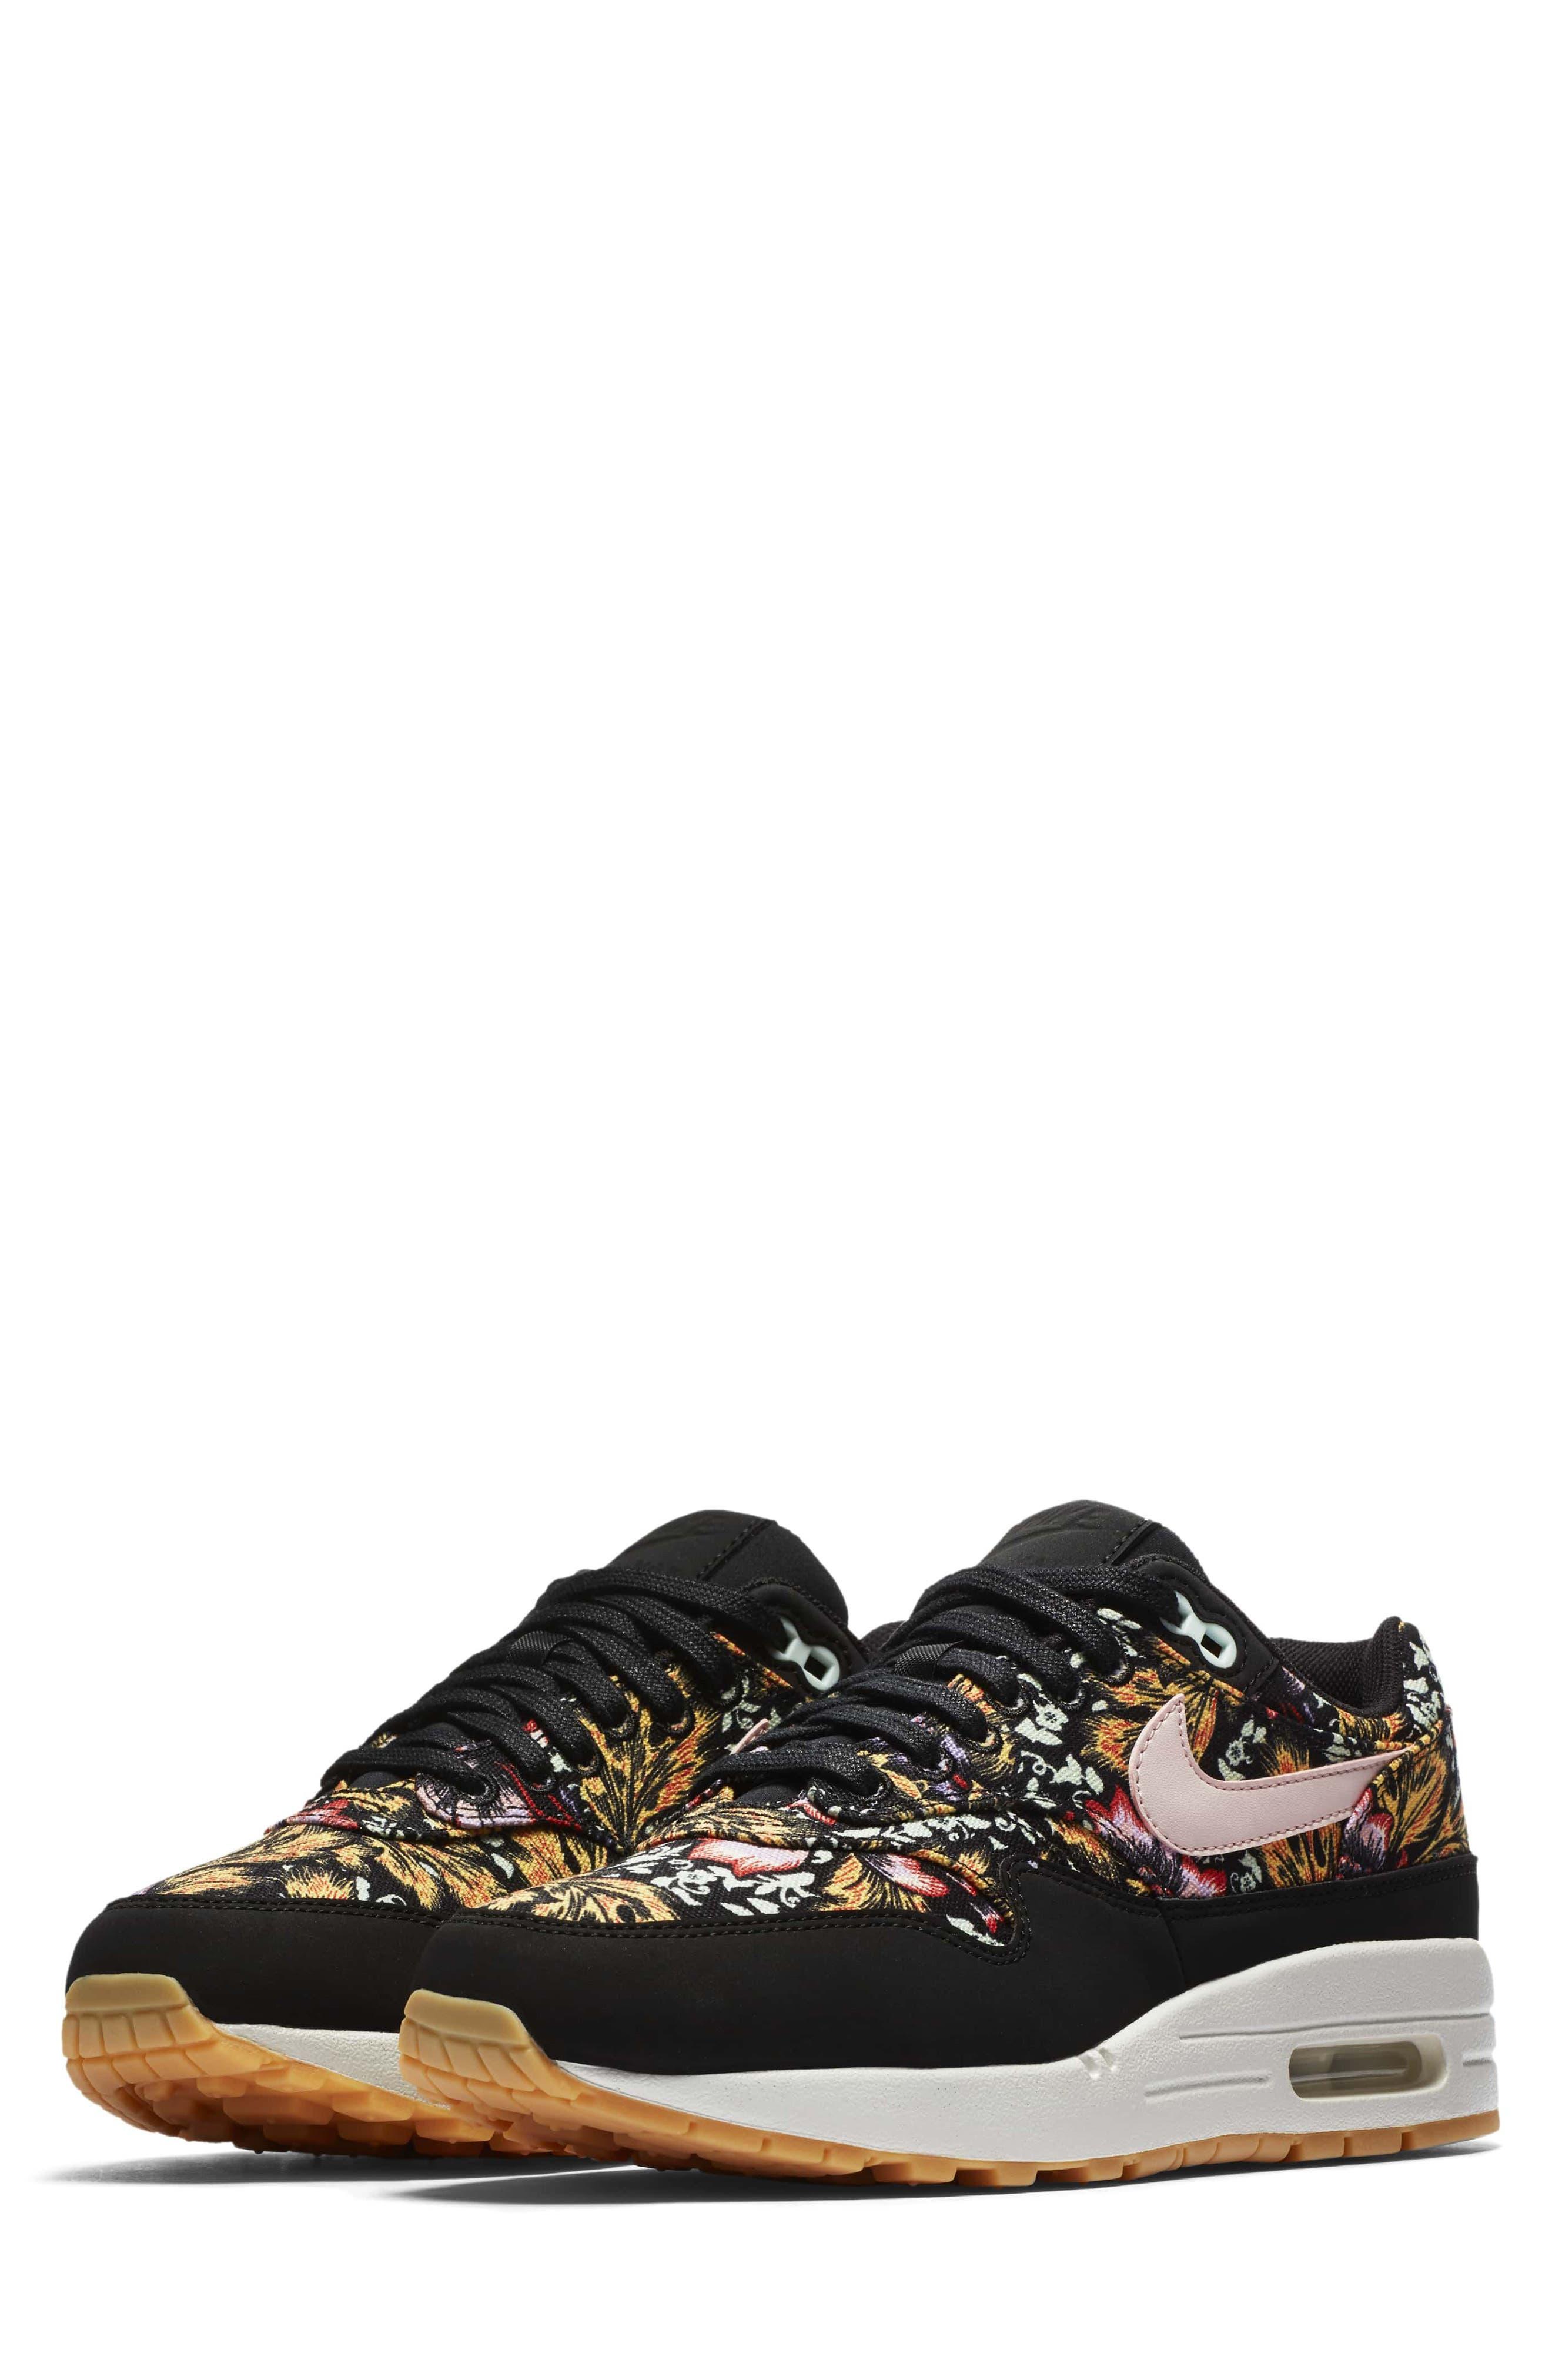 Air Max 1 QS Sneaker,                             Main thumbnail 1, color,                             003